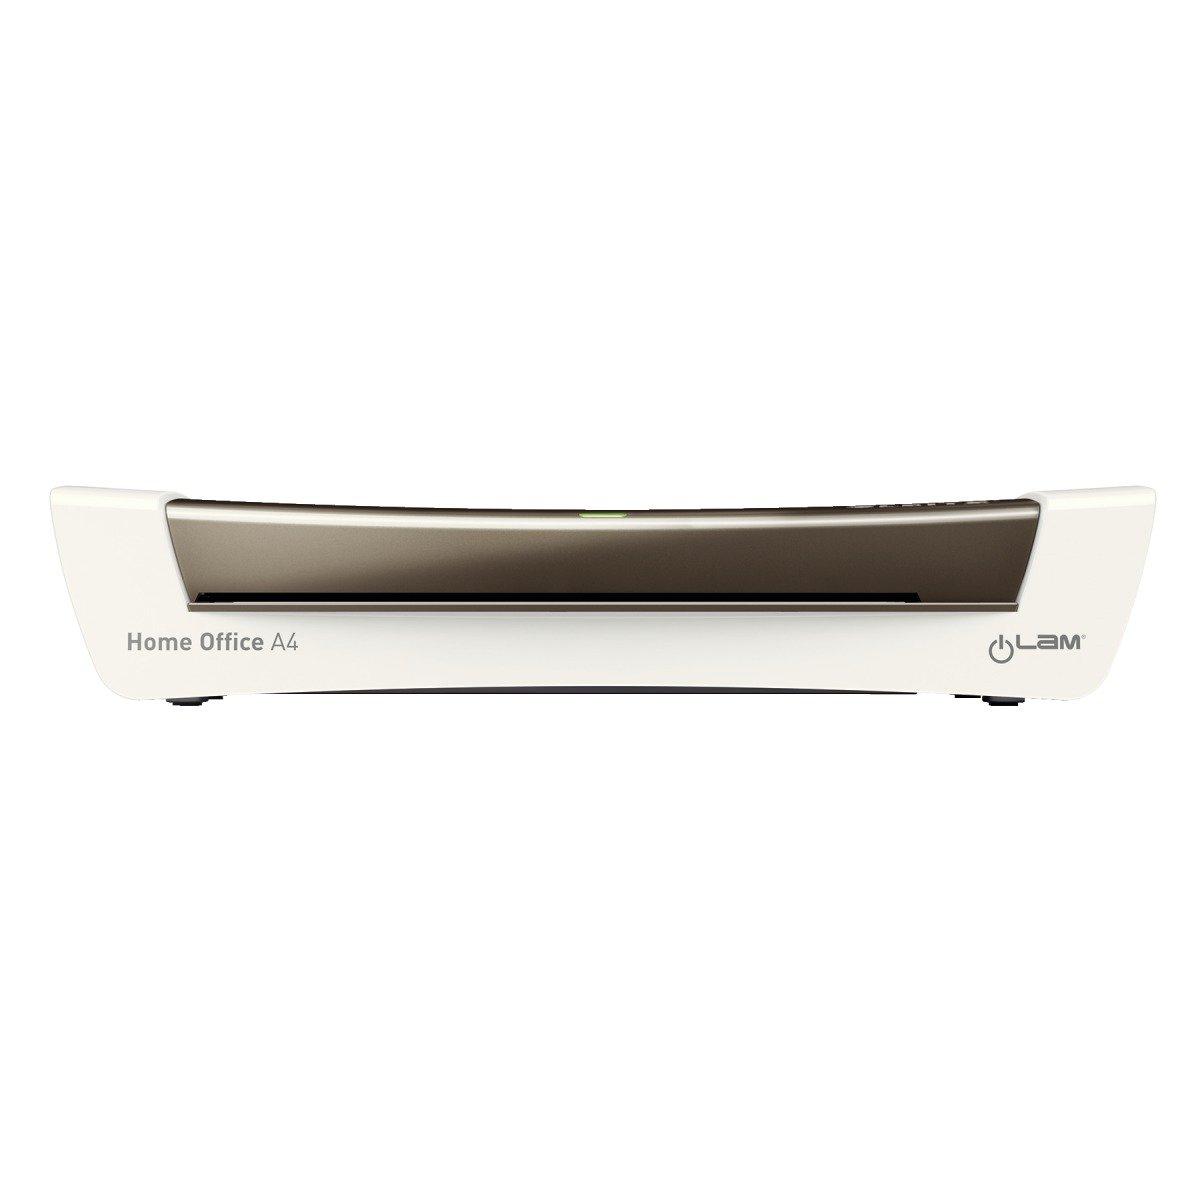 Plastificadora A4 Leitz WOW 73680089 iLam color gris met/álico